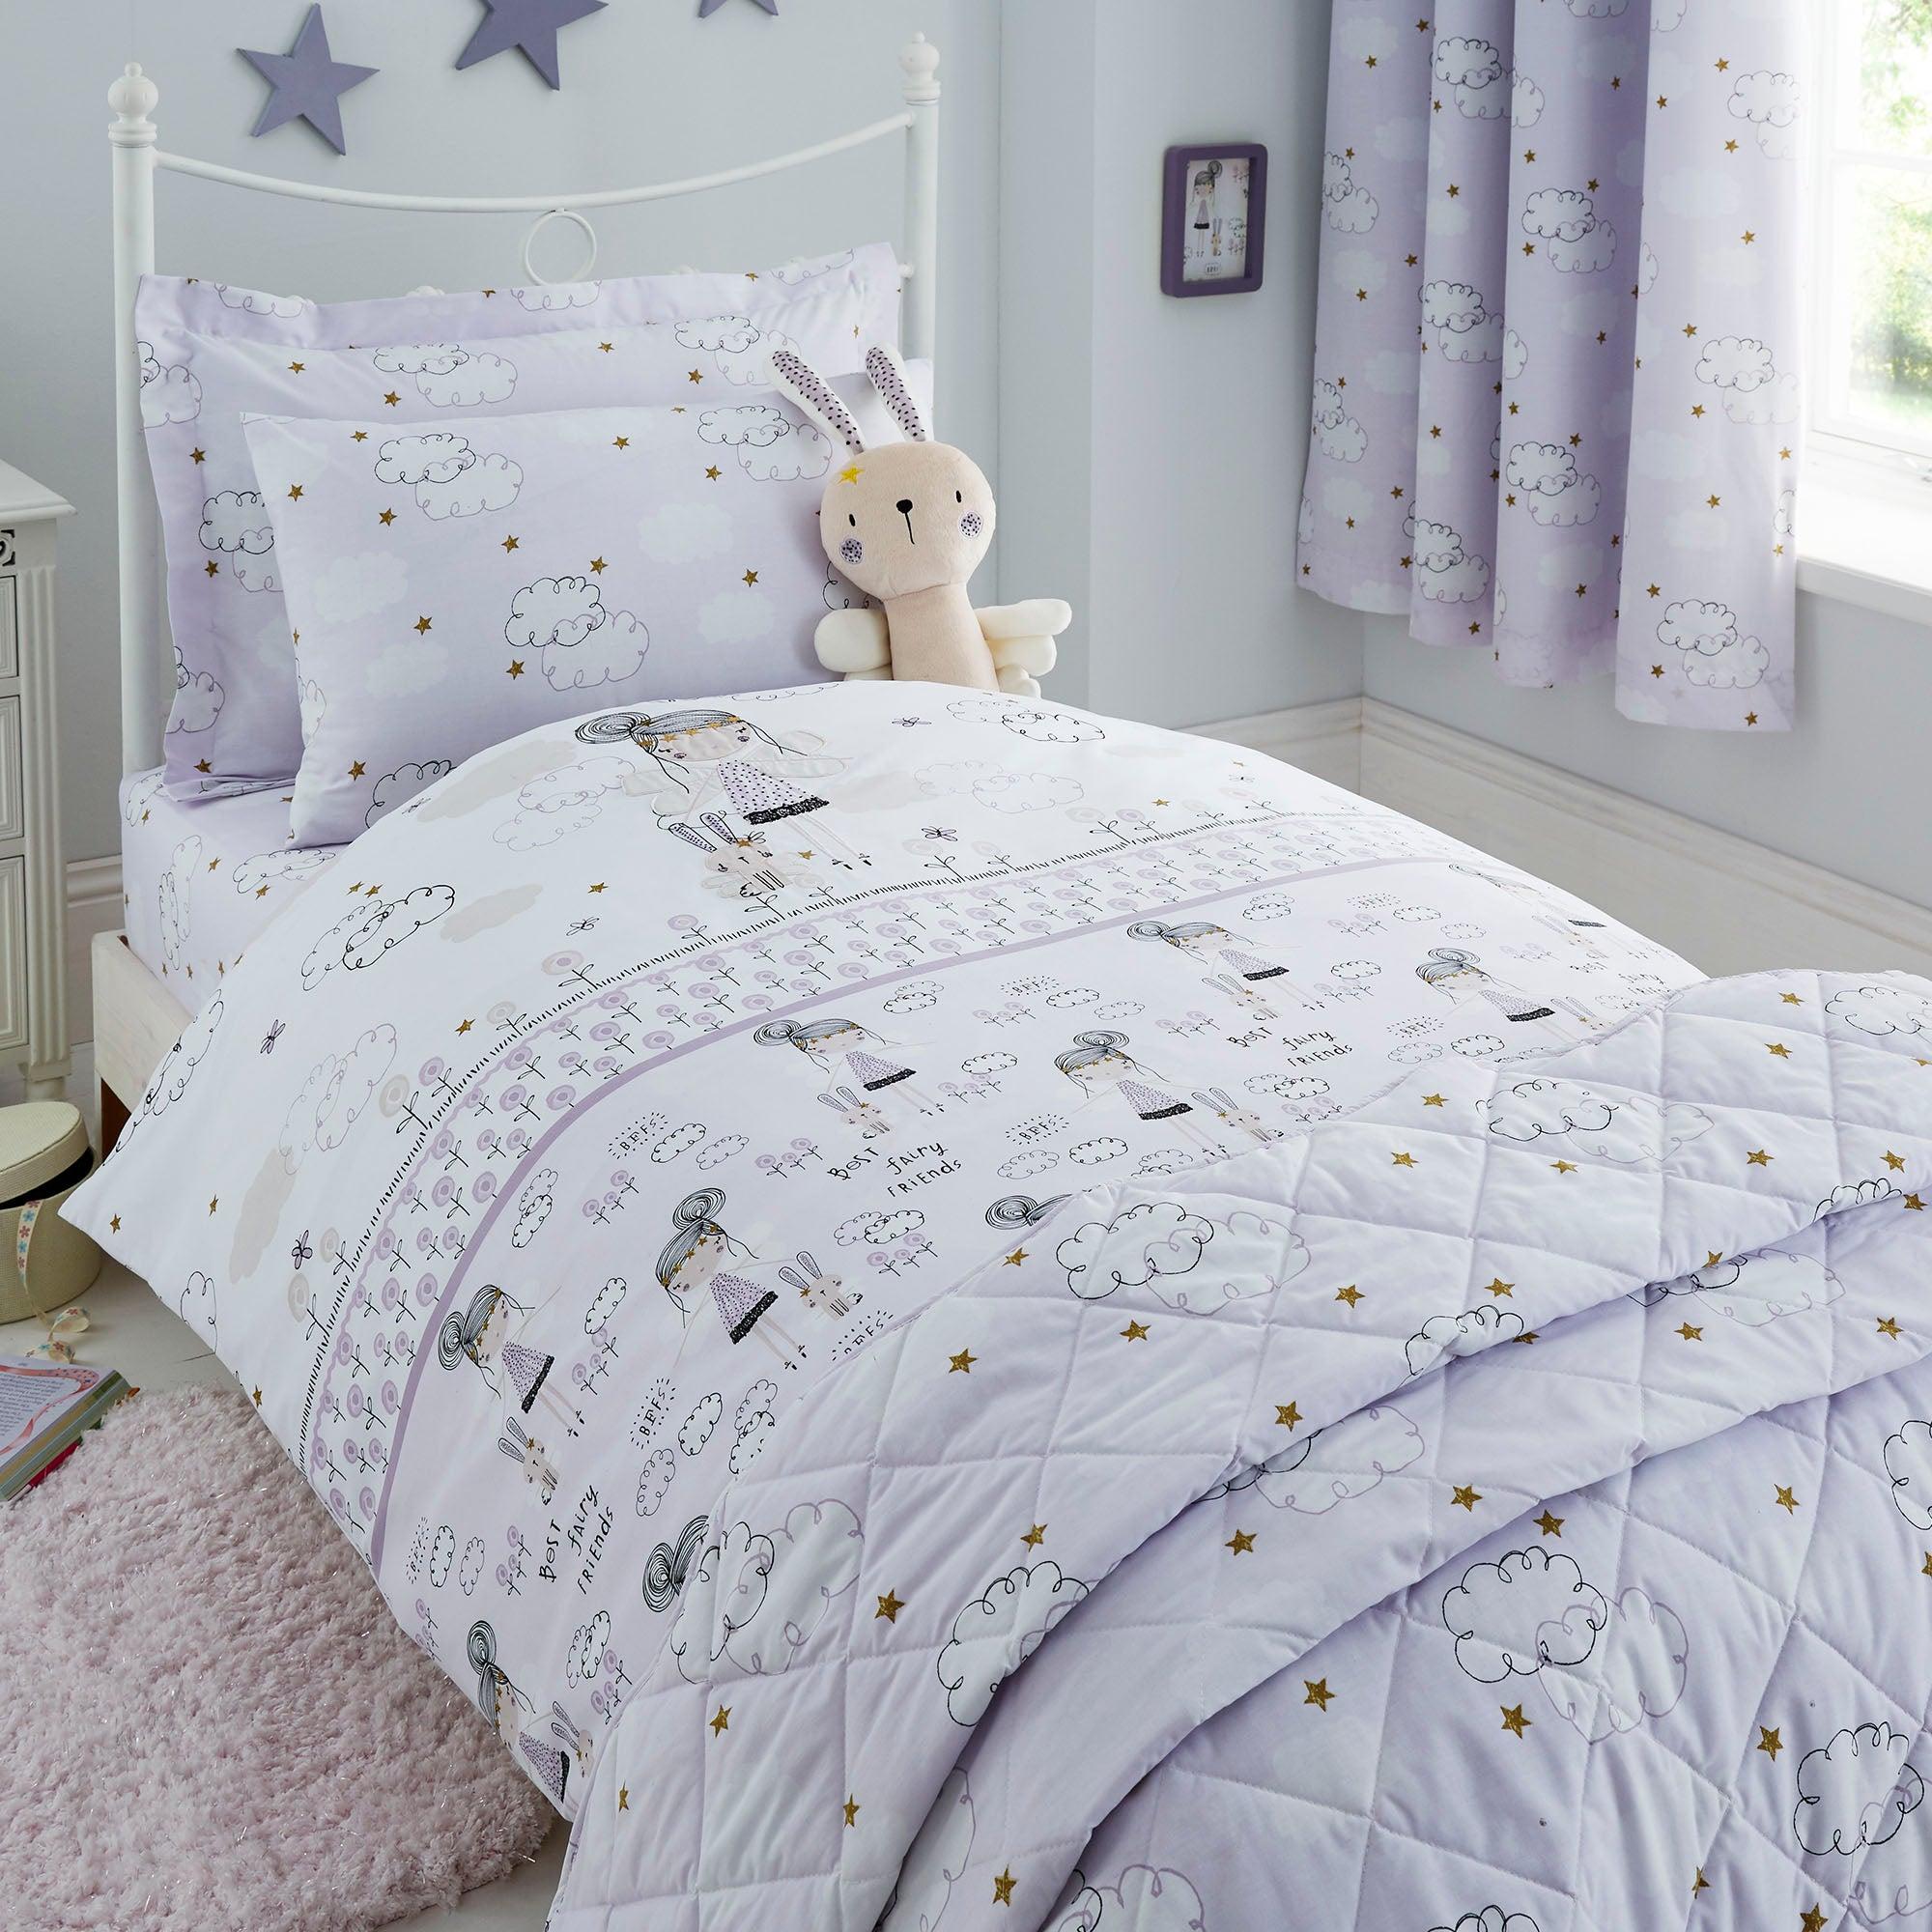 Dreamy Days Lilac Duvet Cover and Pillowcase Set Lilac